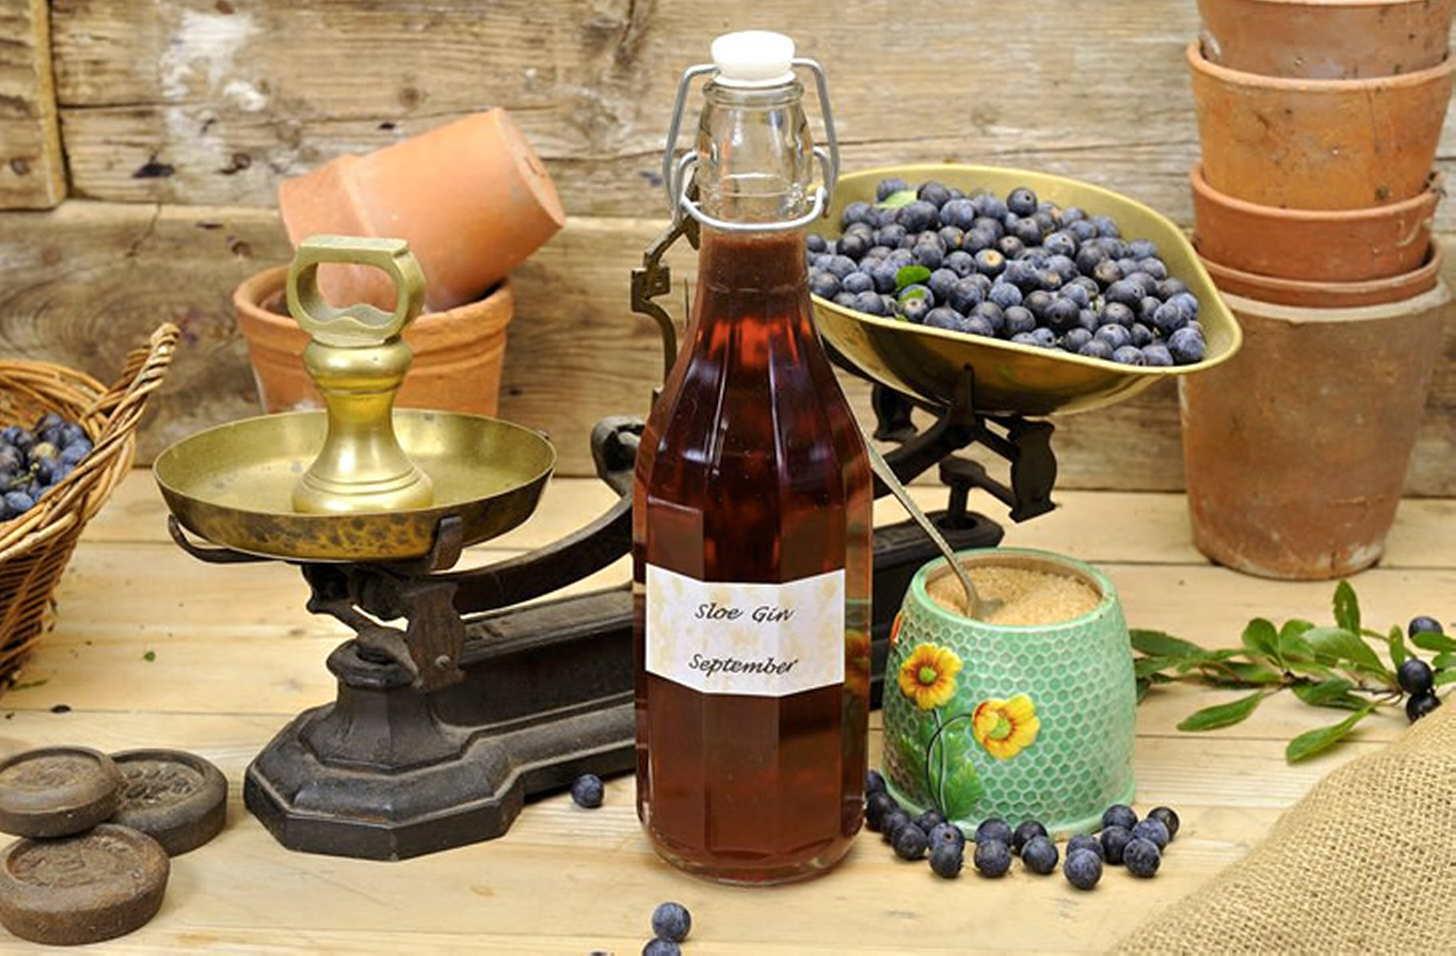 Рецепты настоек из терна на водке, спирте и анисовке